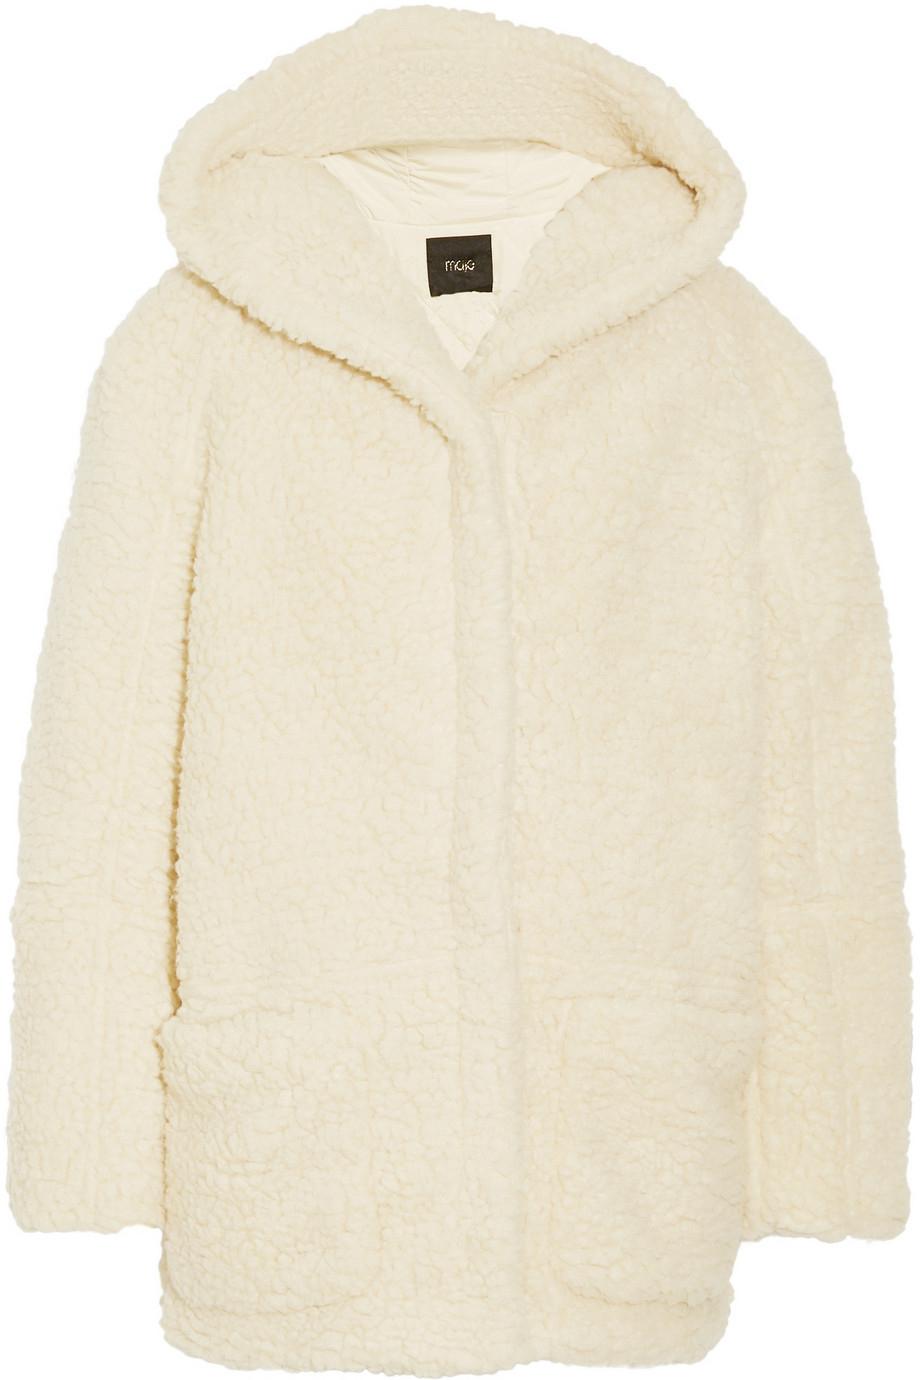 Maje Girofard Hooded Faux Shearling Coat in White | Lyst